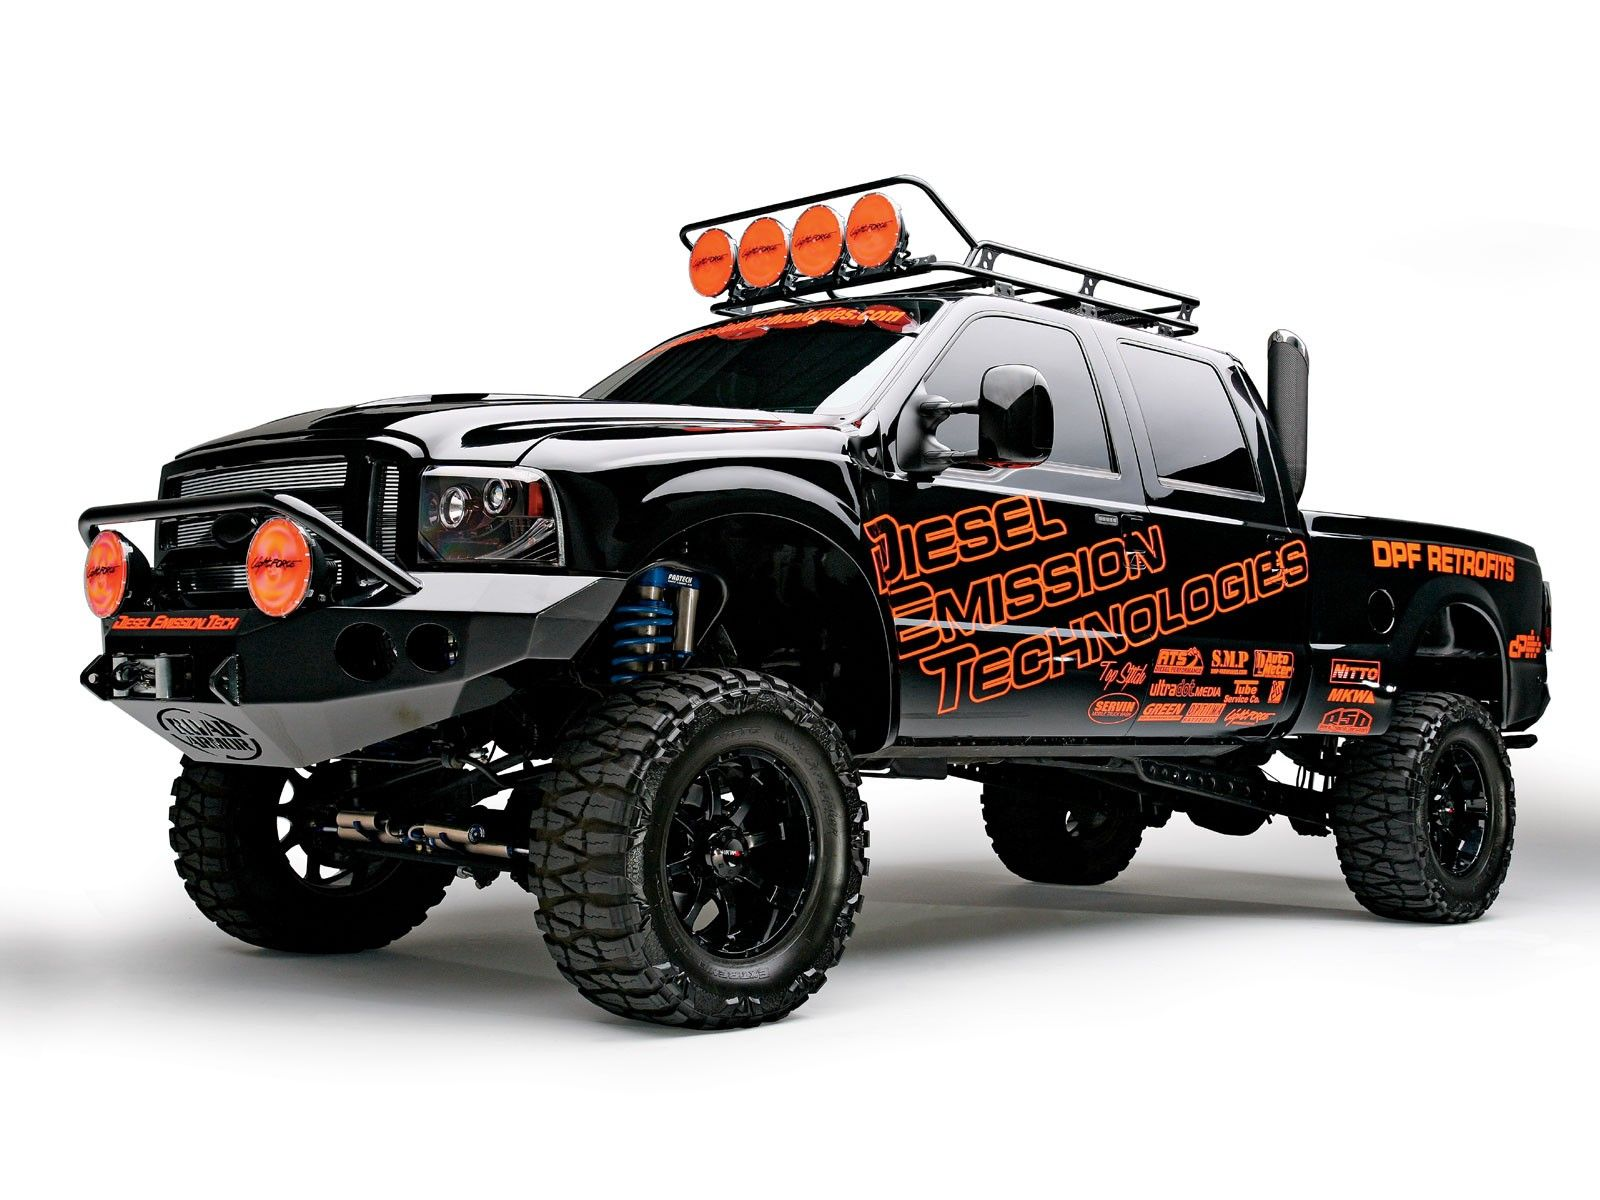 Cars X X Pinterest X Cars And Vehicle - Cool cars 4x4